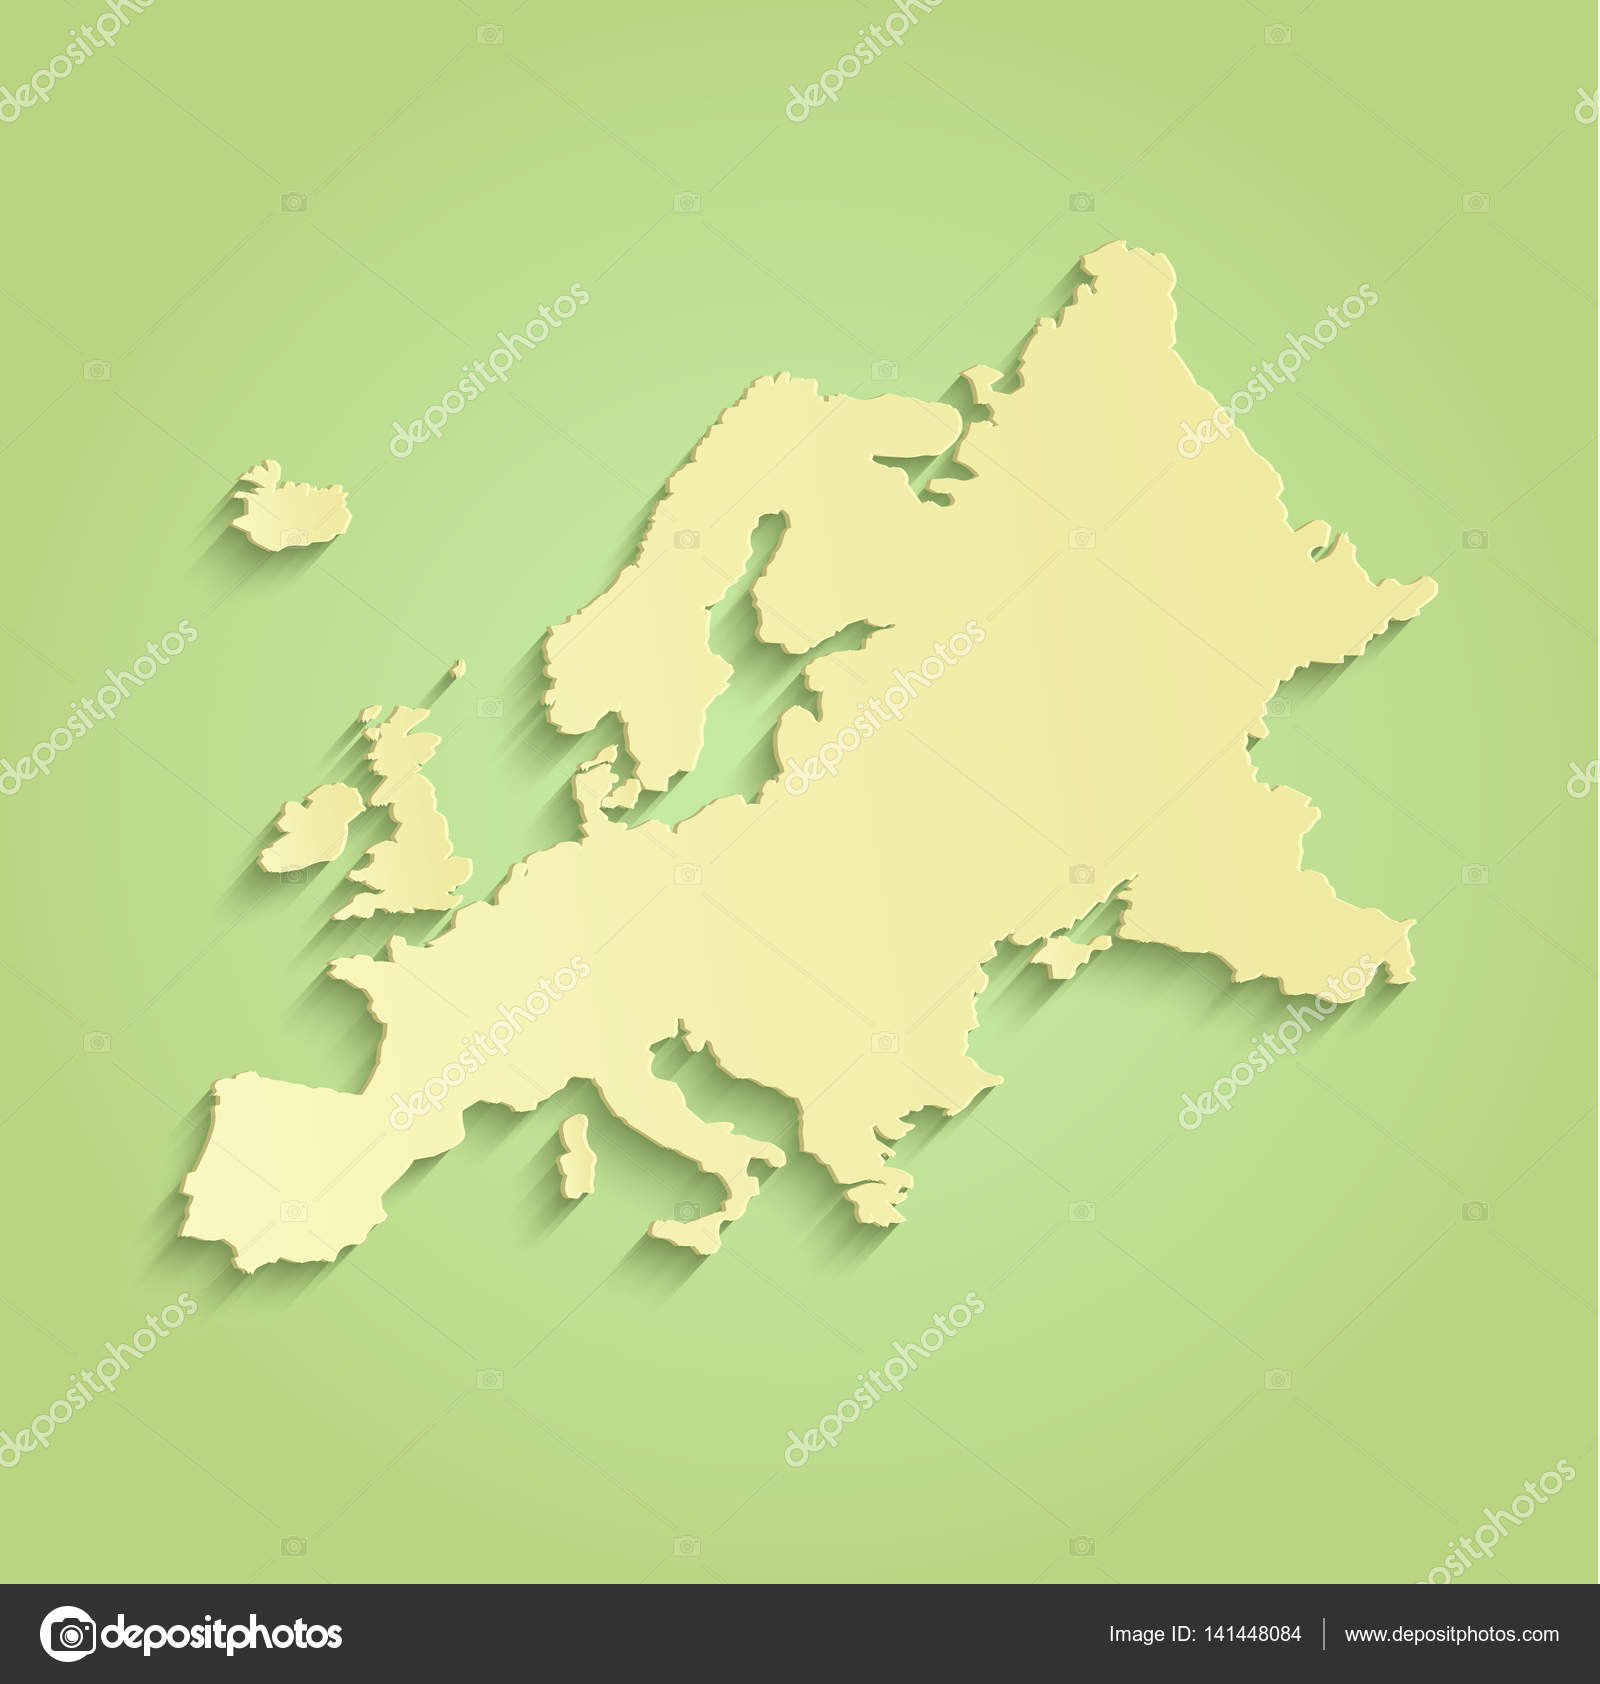 Europe map green yellow raster blank stock photo mondih 141448084 europe map green yellow raster blank stock photo gumiabroncs Gallery